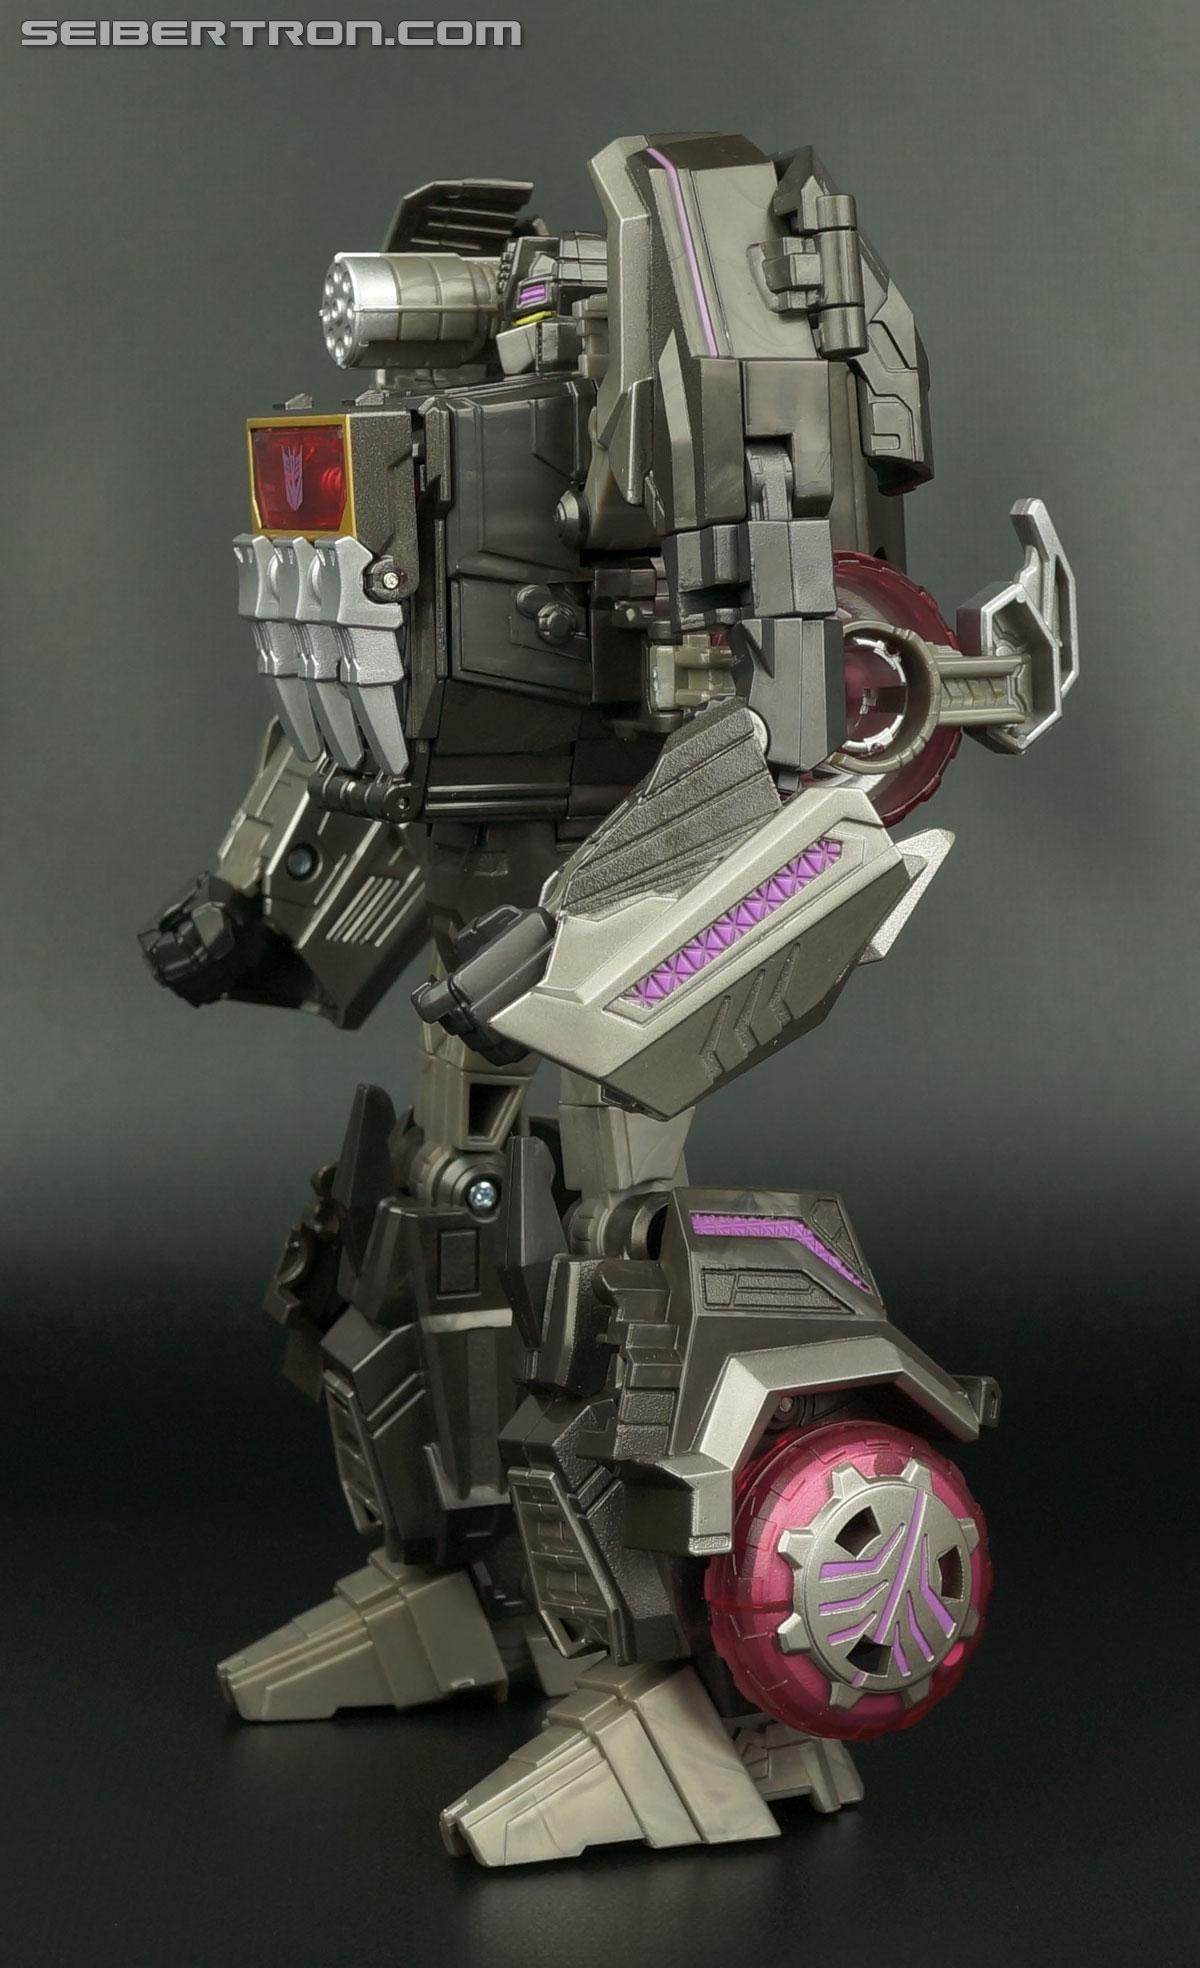 Transformers Generations Soundblaster (Image #60 of 120)